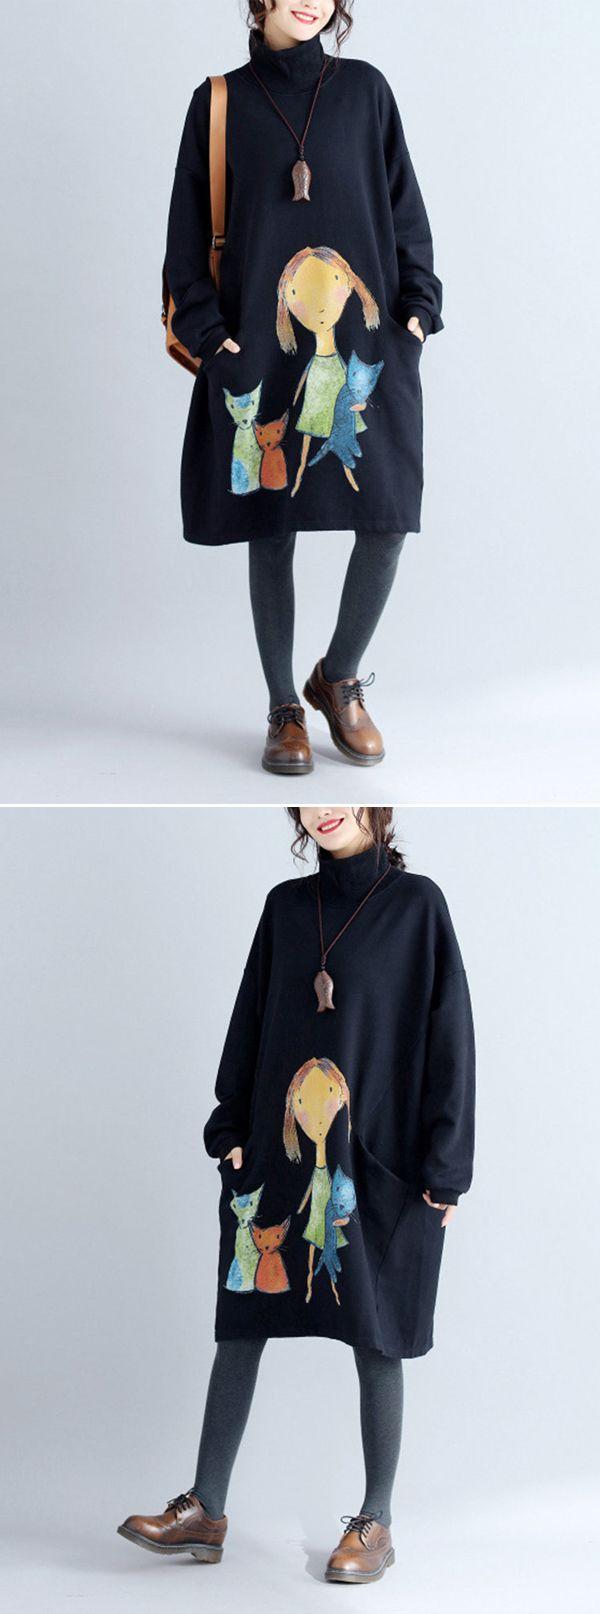 [Newchic Online Shopping] 48%OFF Women's Cat Printed Sweatshirt Dresses